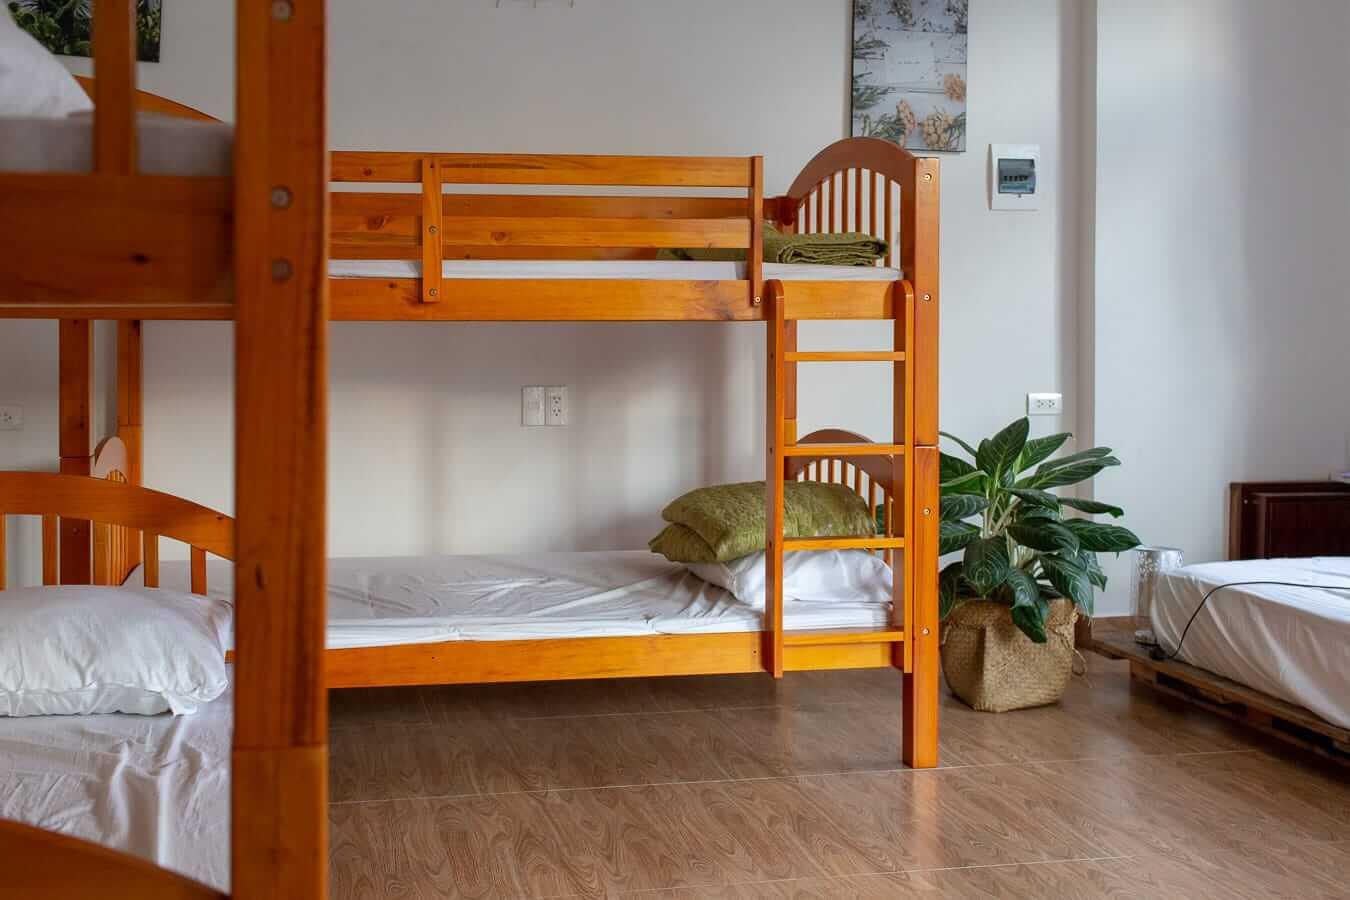 Bisou De La Riviere Homestay: Hoi An Budget Accommodation